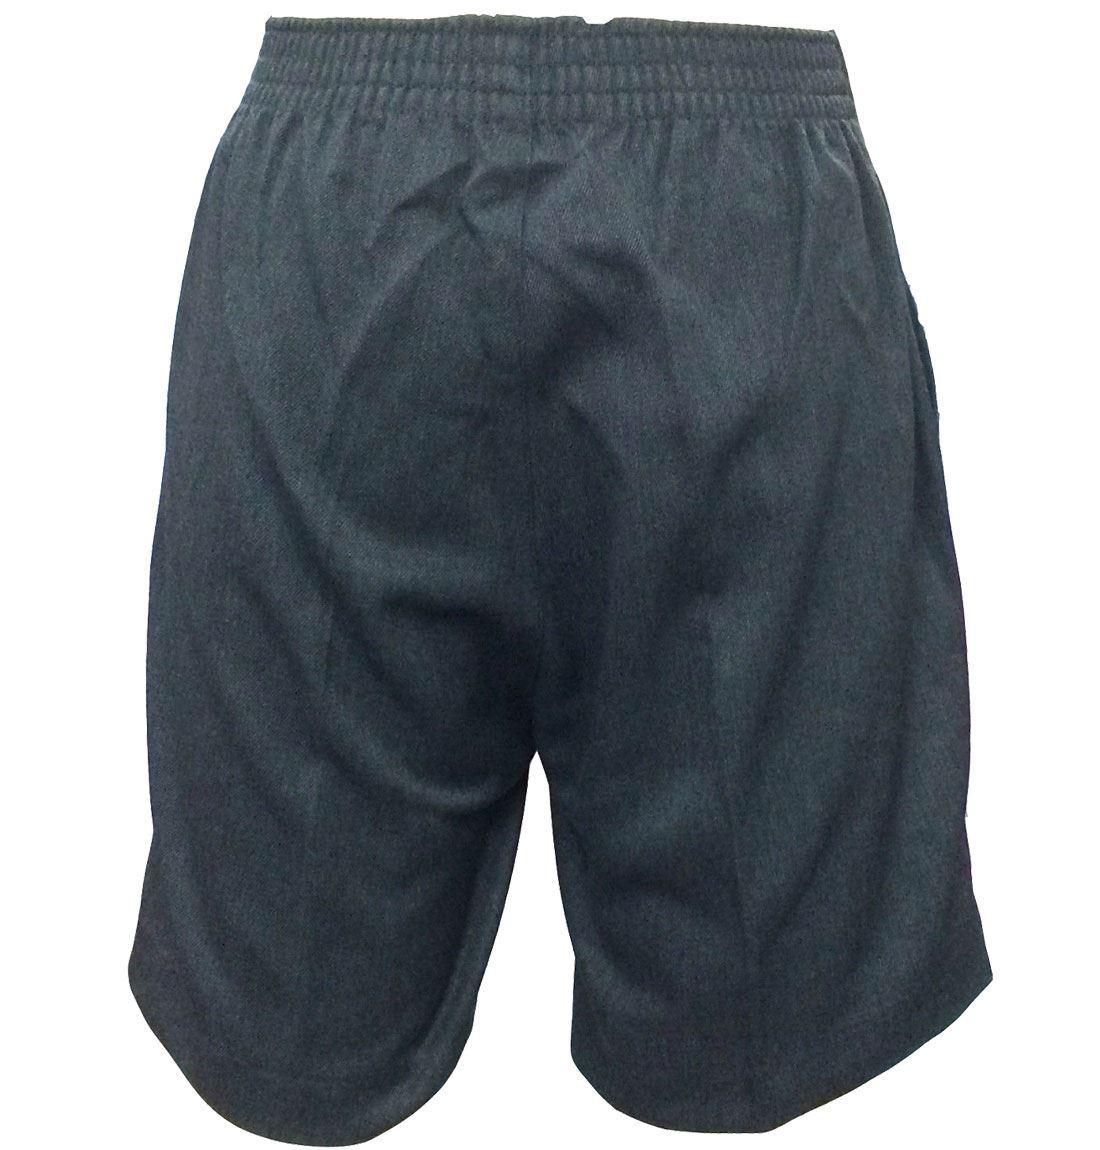 Islander Fashions Kids Boys Half Elasticated Waist Pull Up Shorts Childrens School Uniform Shorts 3-16 Years